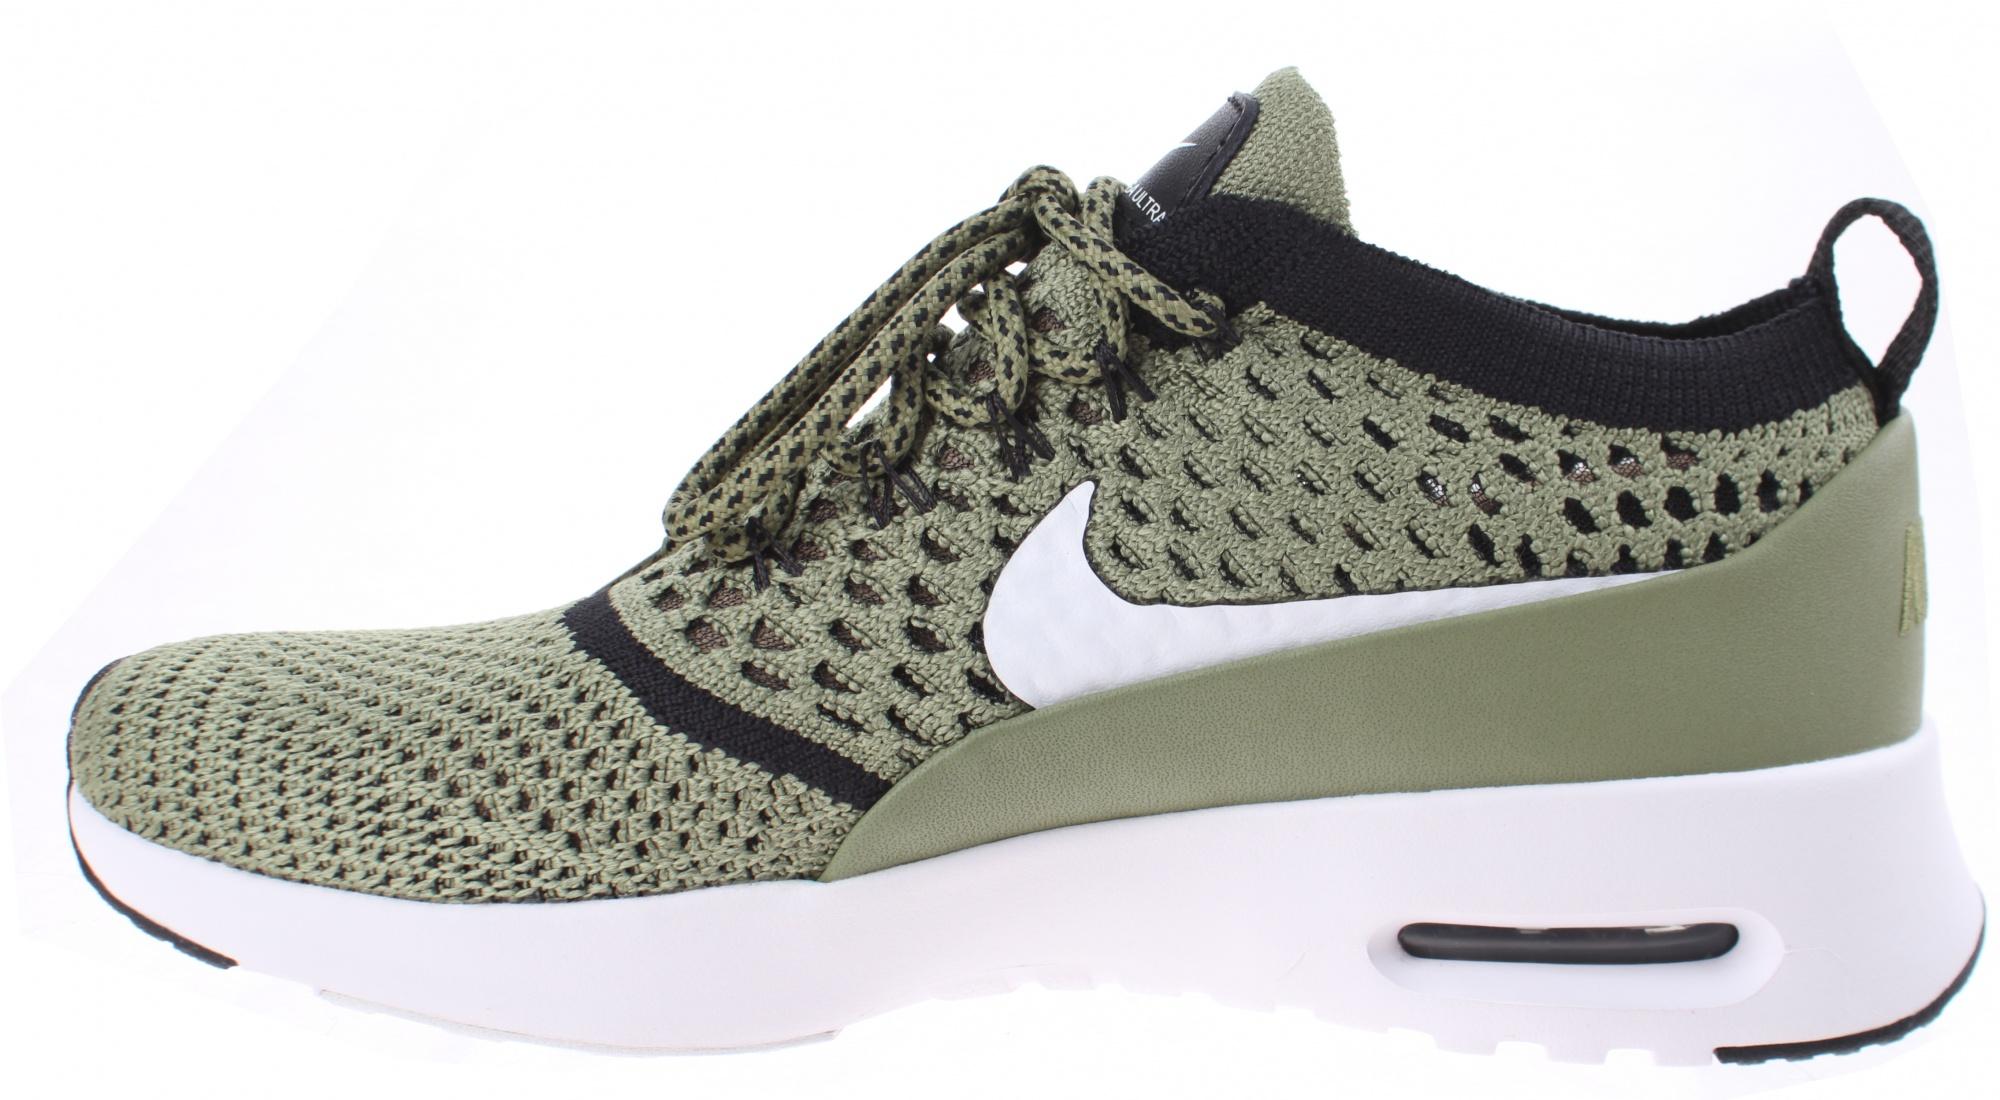 meet 43342 691e9 Nike sneakers Air Max Thea Ultra Flyknit ladies green ...